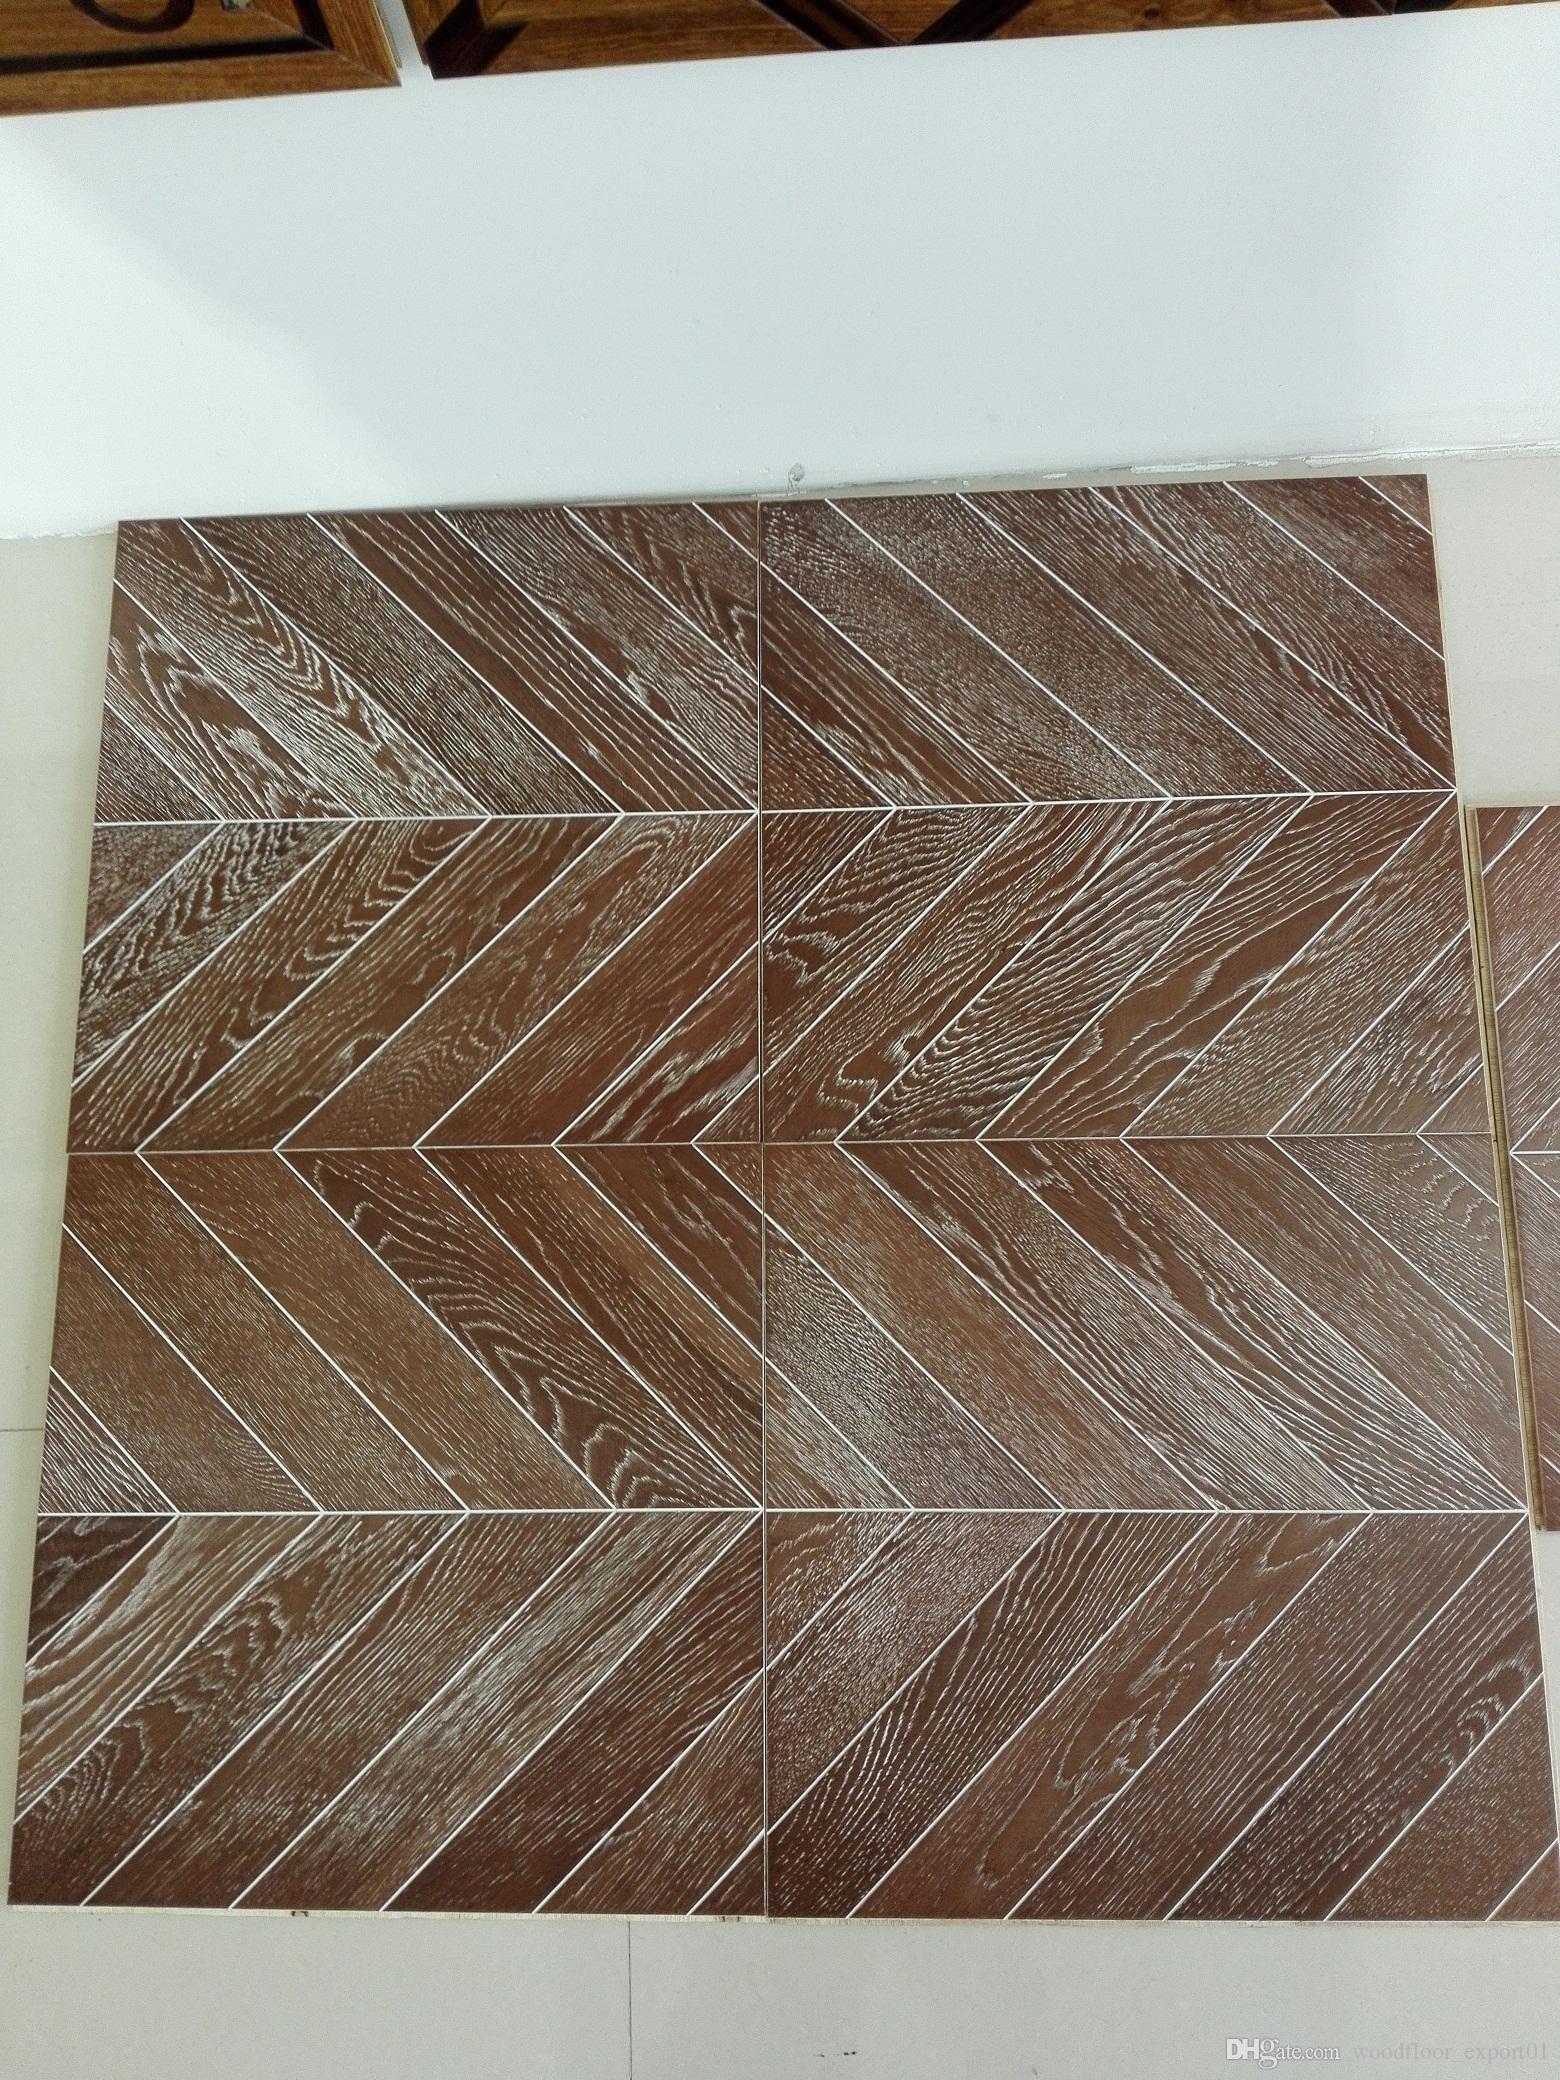 Oak Floor Decor Room Bedroom Set Decorative Household Flooring Tool - Www floordecor com